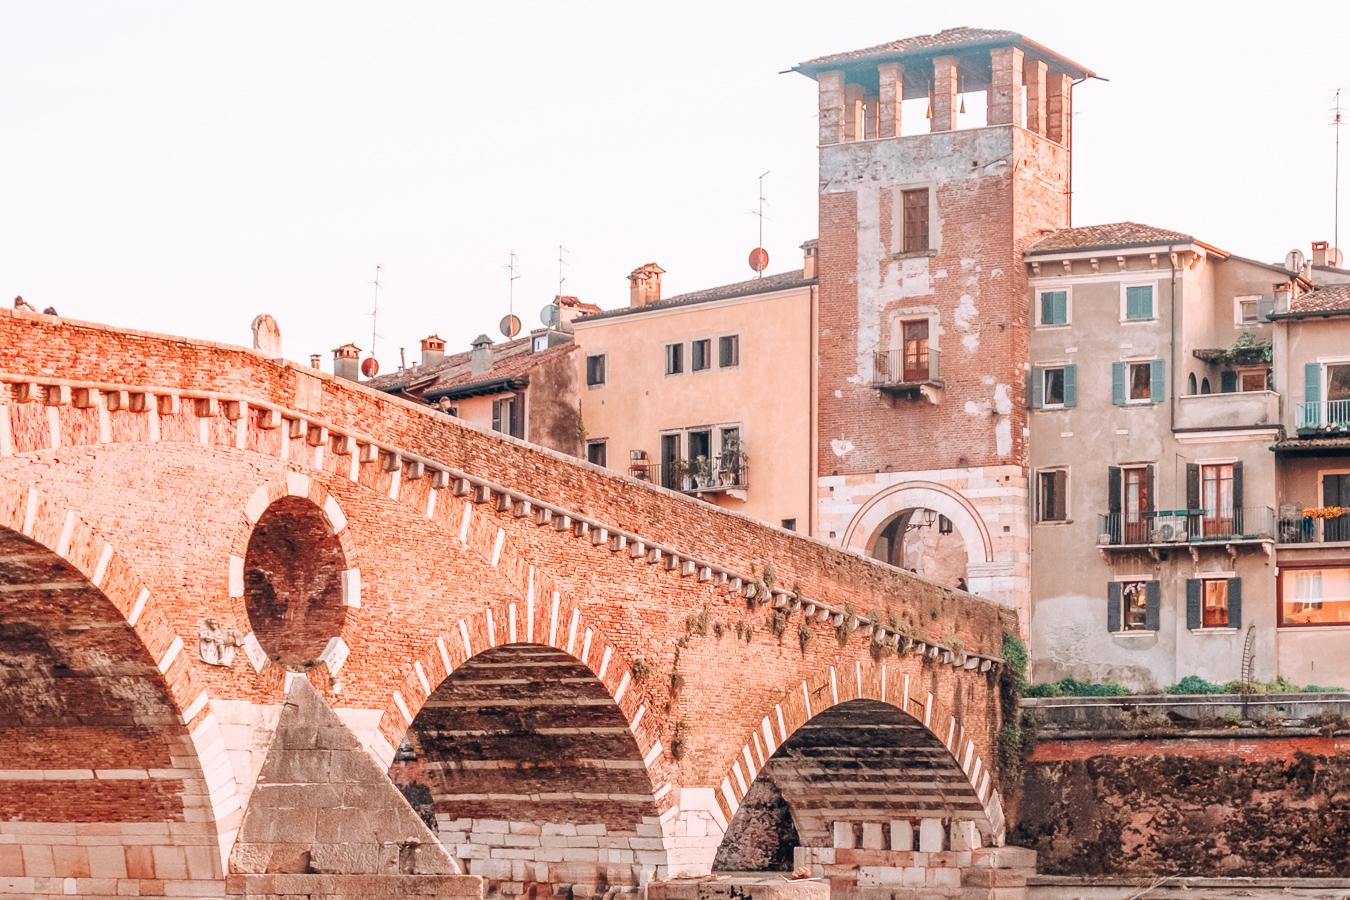 The historic center of Verona